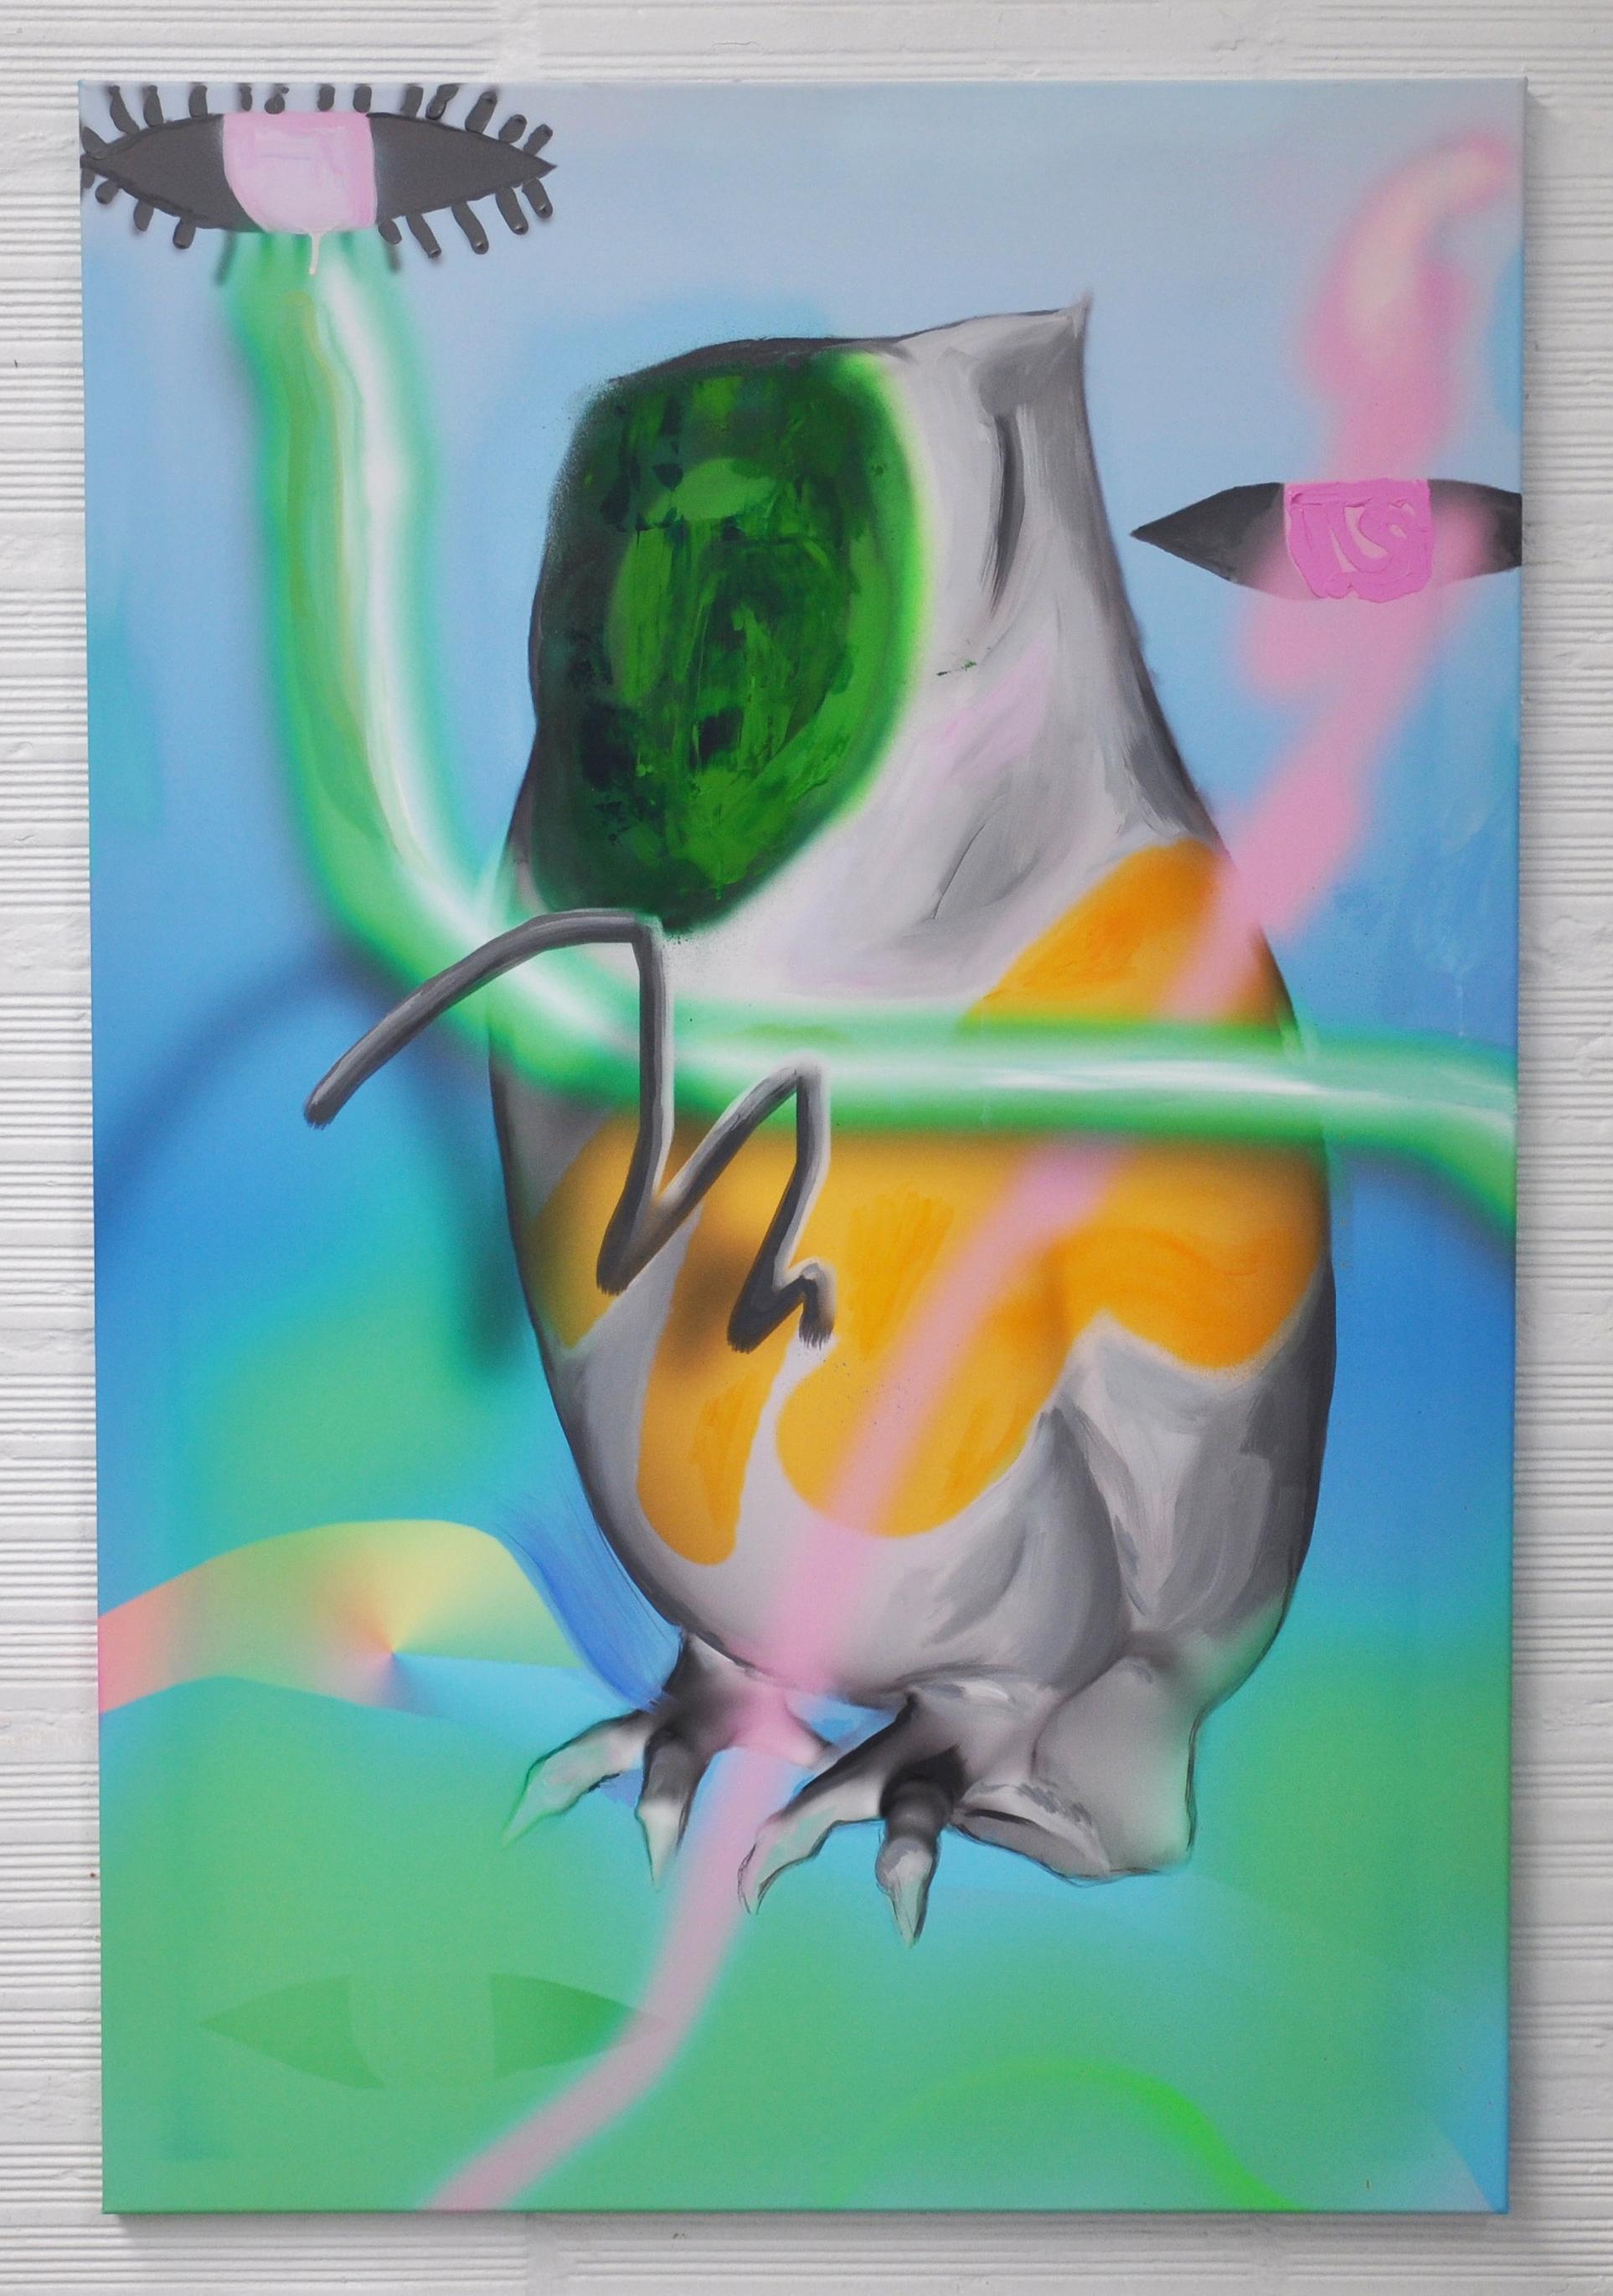 atavism 2, acrylic on canvas, 120x80cm